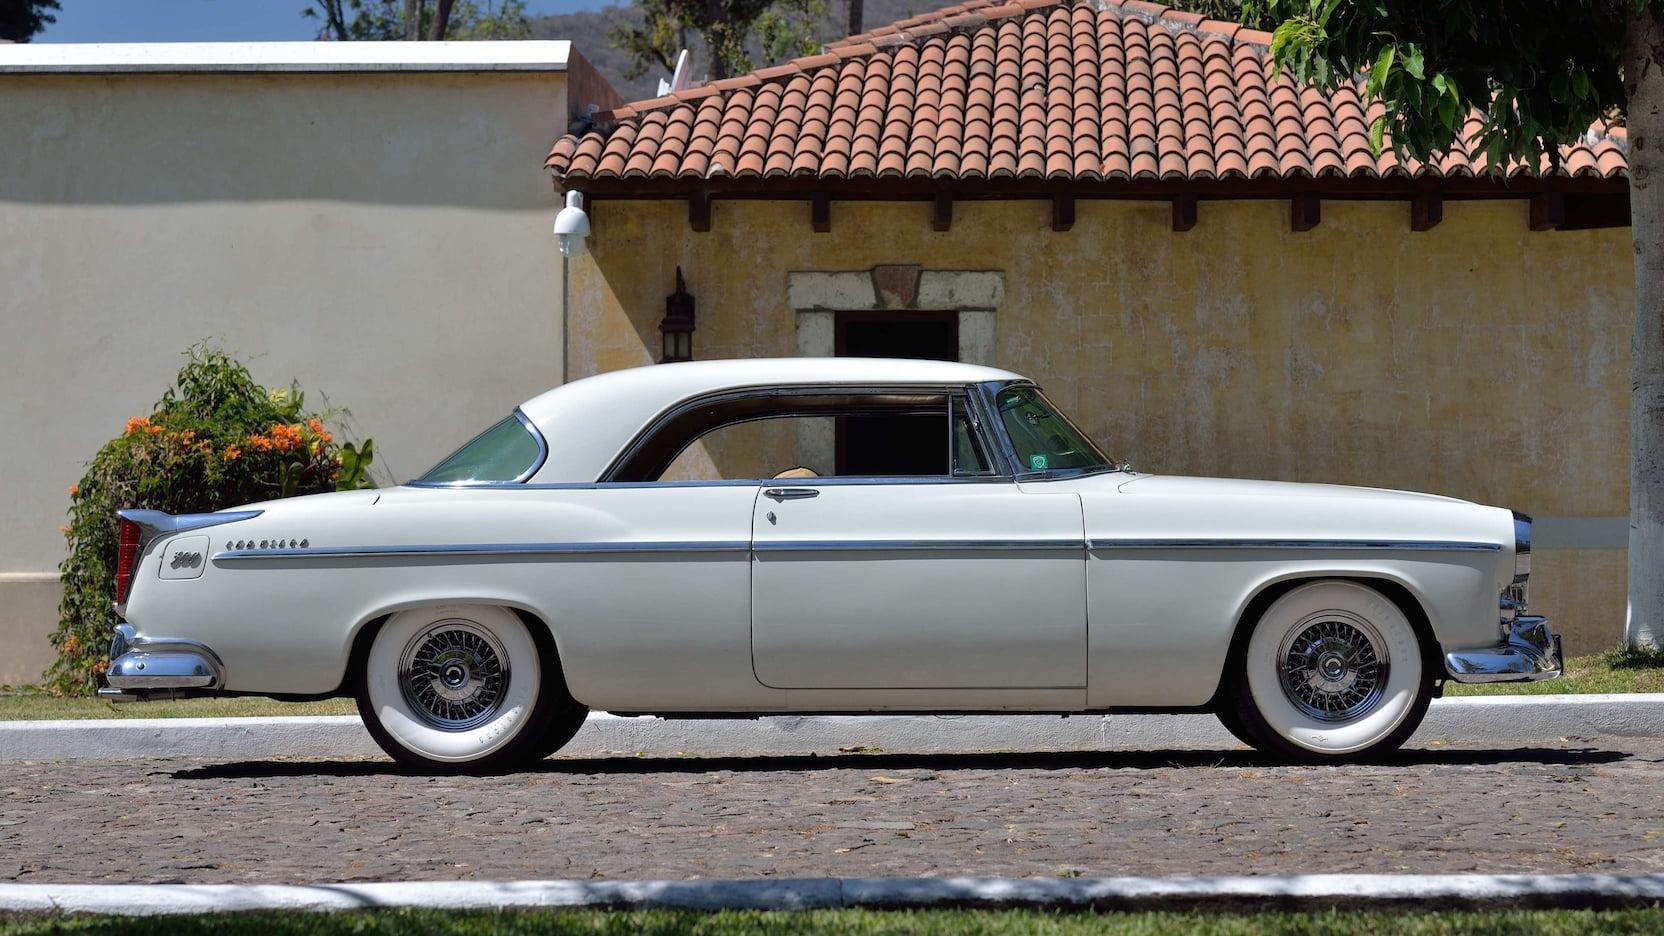 Chrysler C-300 automobile muscle car